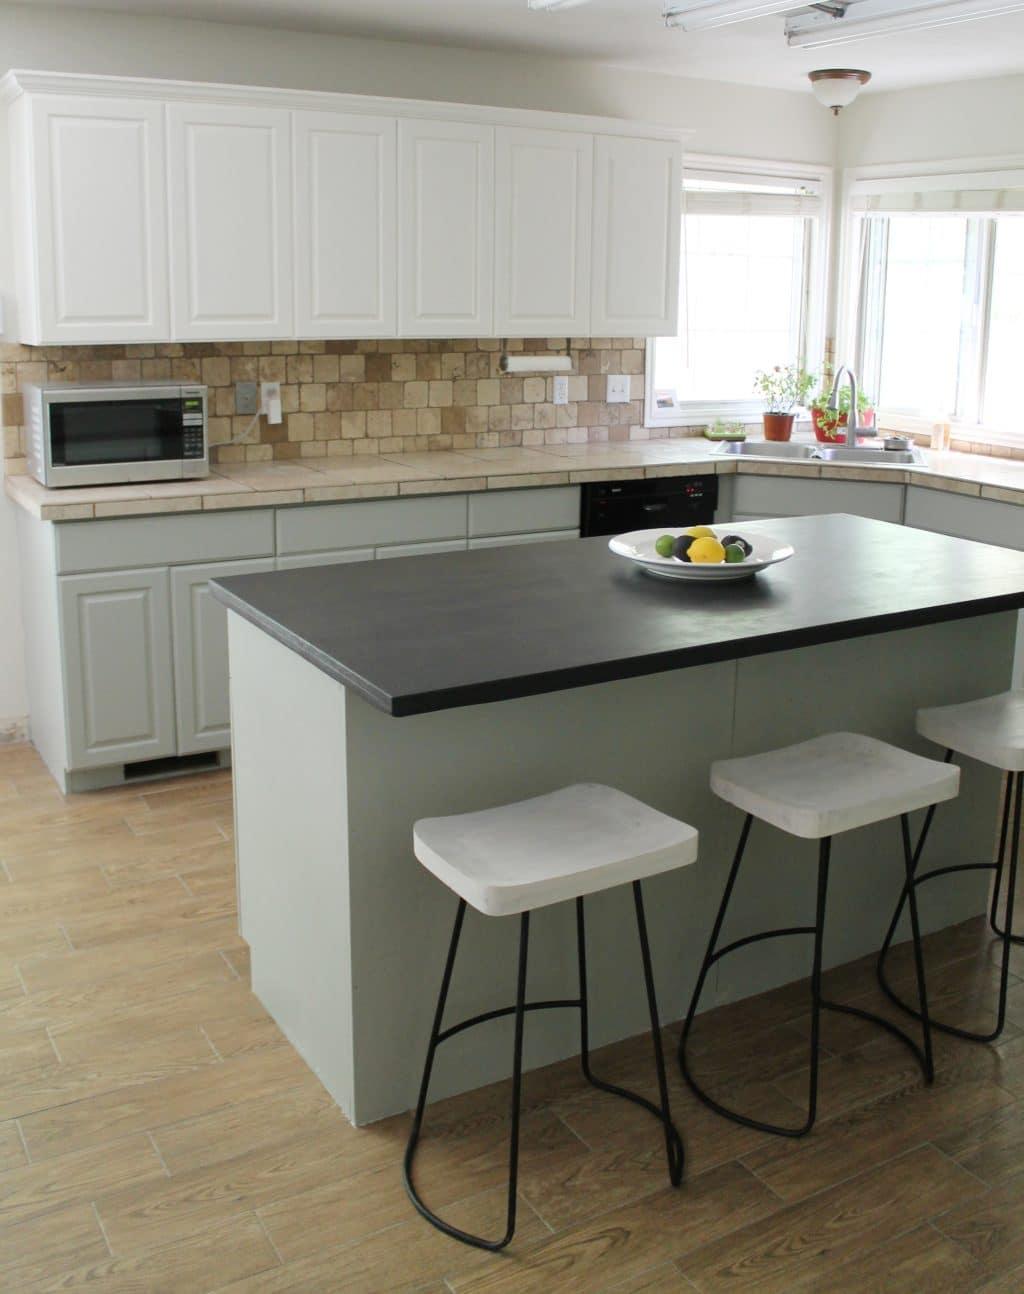 Best Kitchen Gallery: Our Painted Kitchen Cabi S Chris Loves Julia of Valspar Kitchen Cabinet Paint Kits on rachelxblog.com